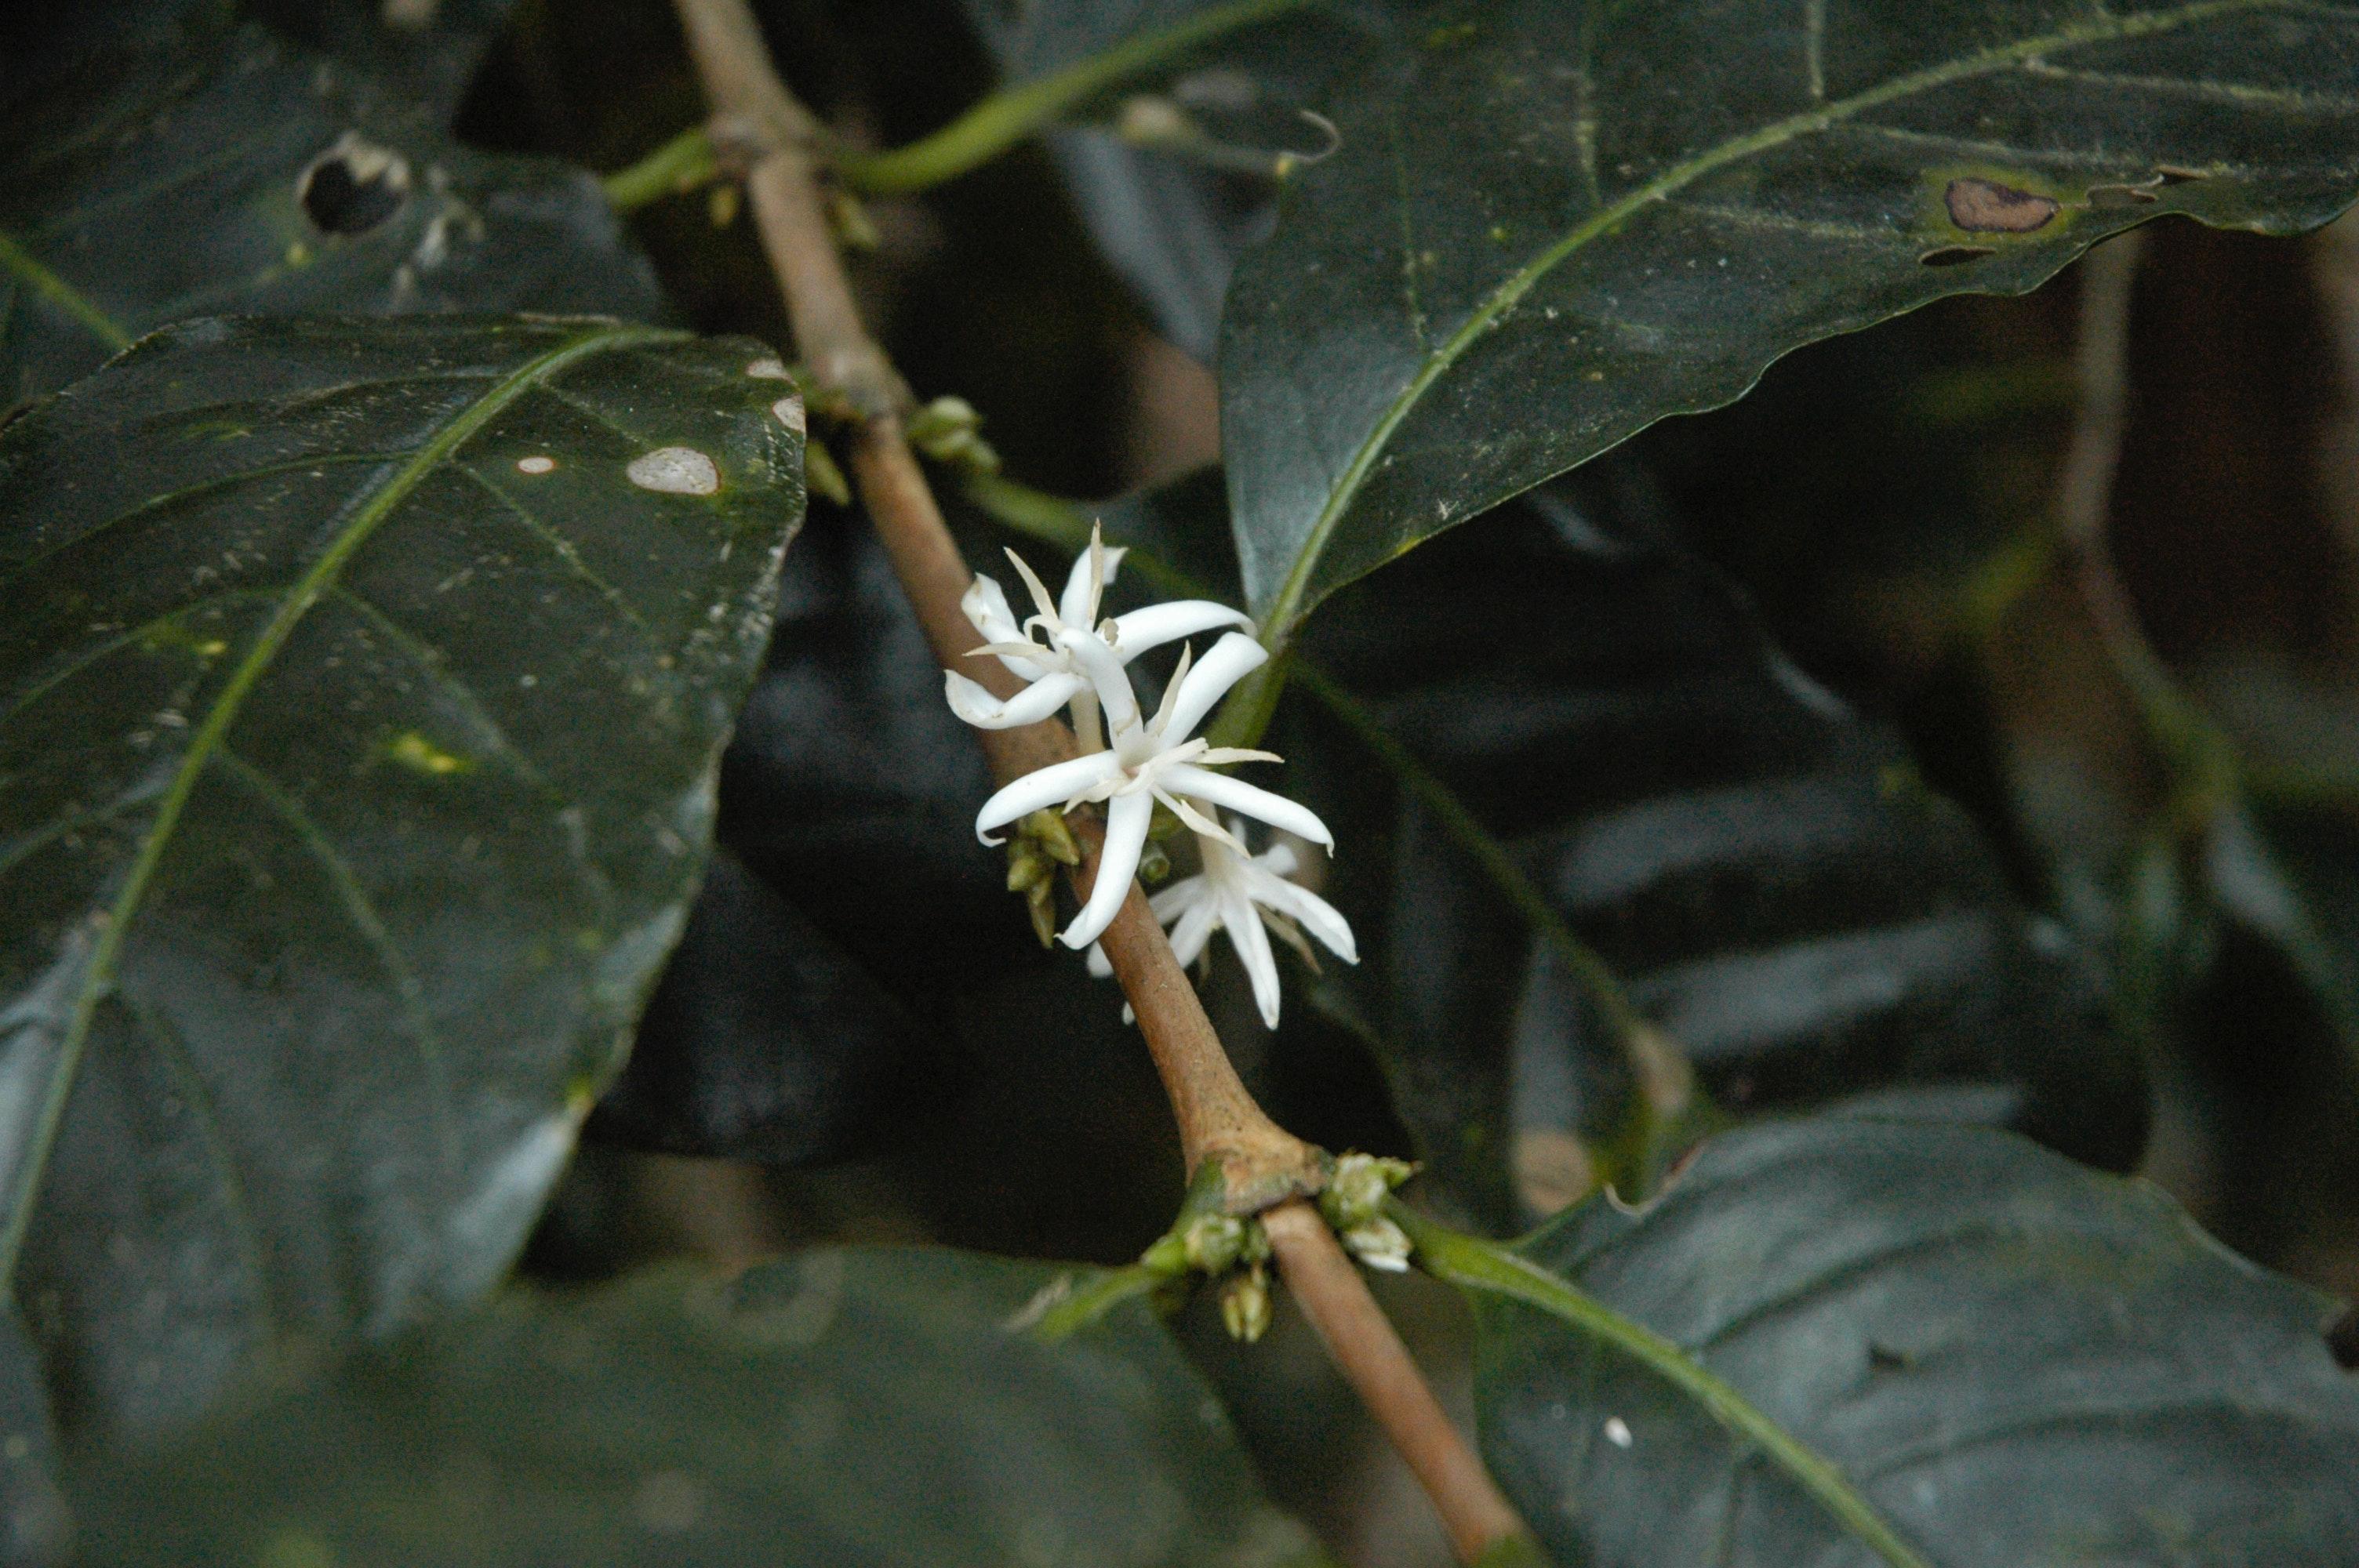 Free stock photo of coffee flowers, coffee plant, white flowers